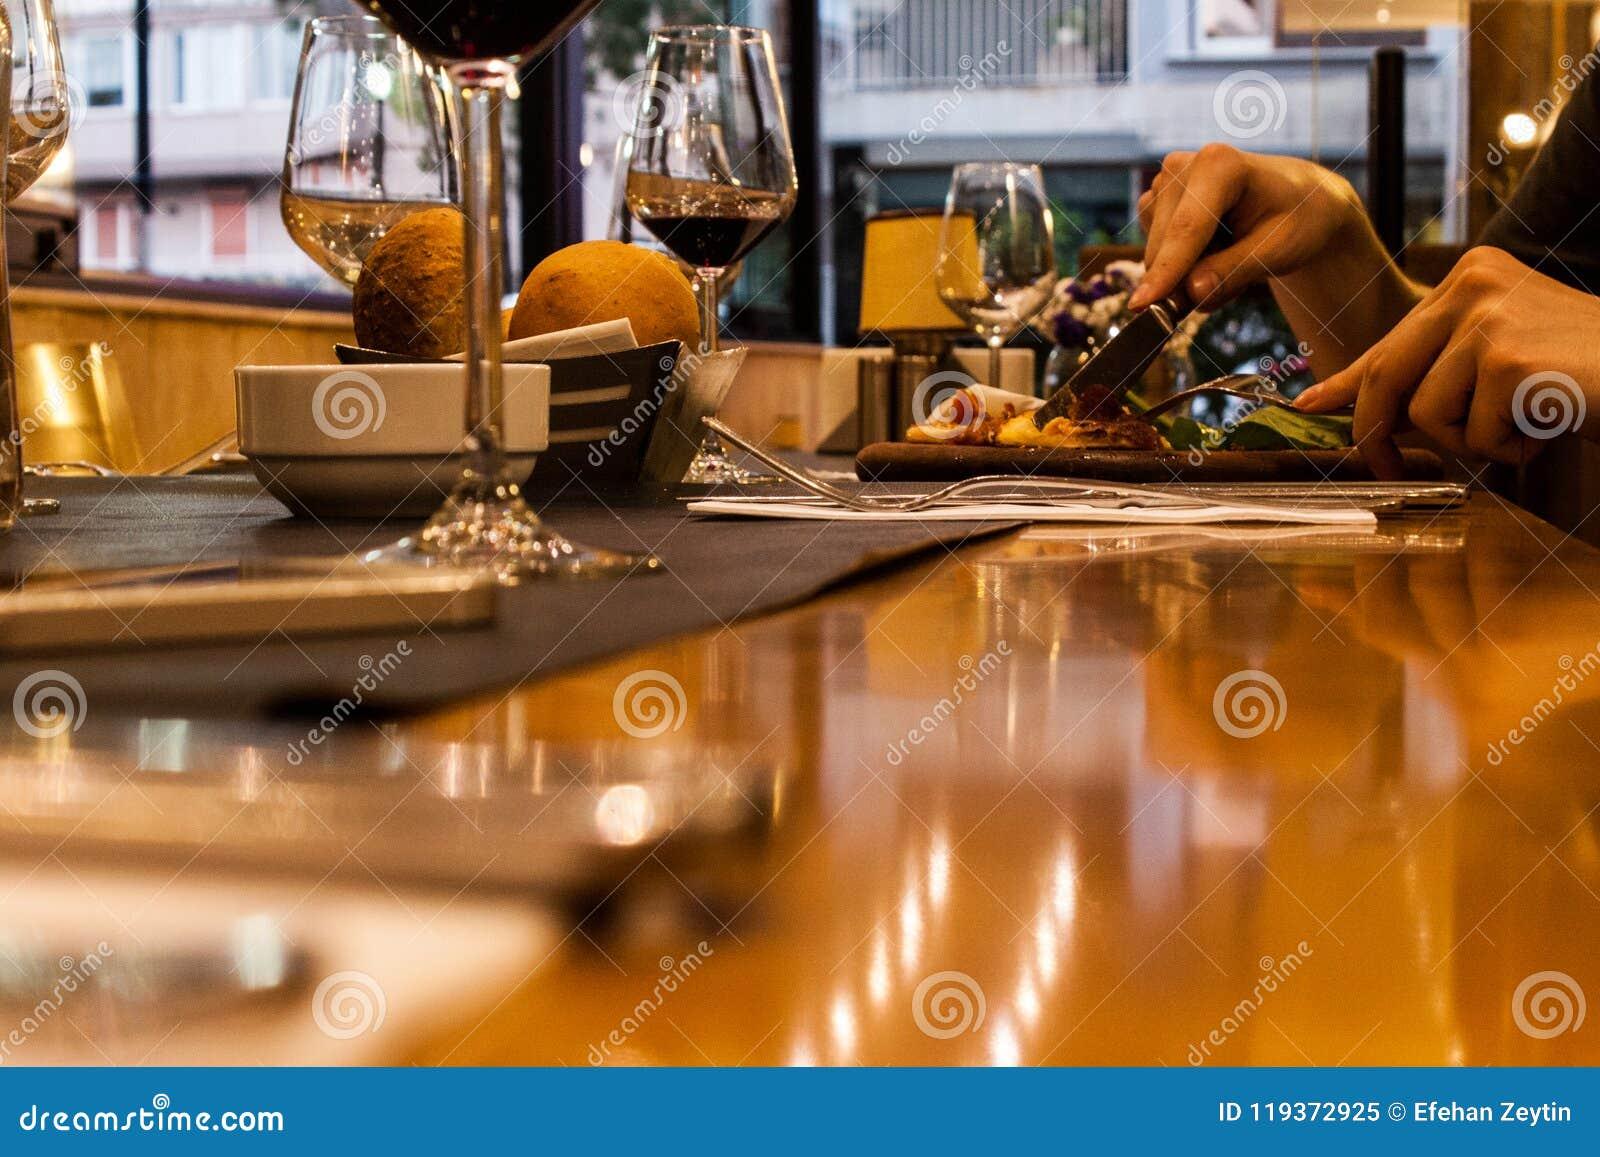 Les gens mangeant leur dîner, fond pointu